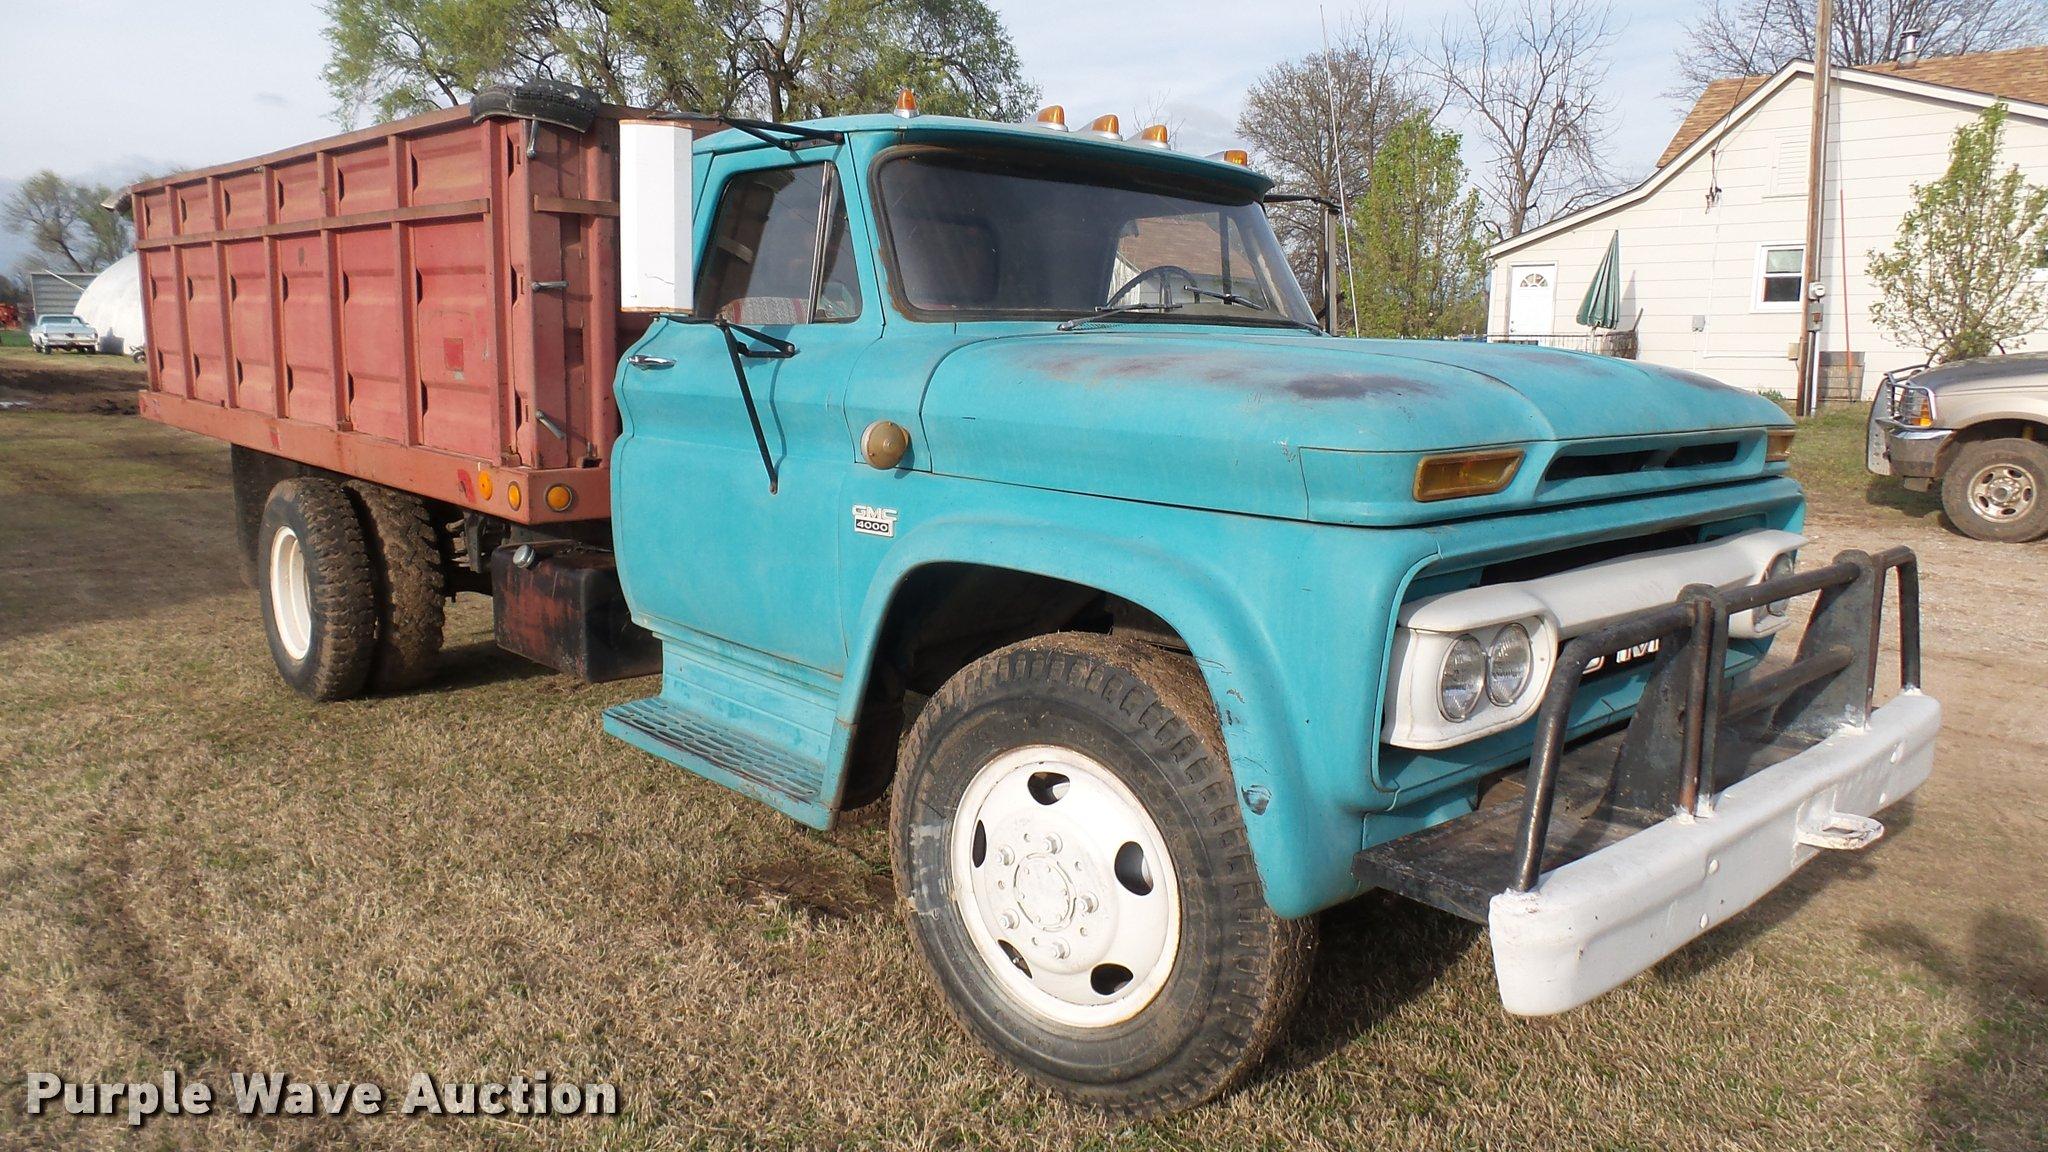 1966 Gmc 4000 Grain Truck In Cheney Ks Item Da2244 Sold Purple Wave